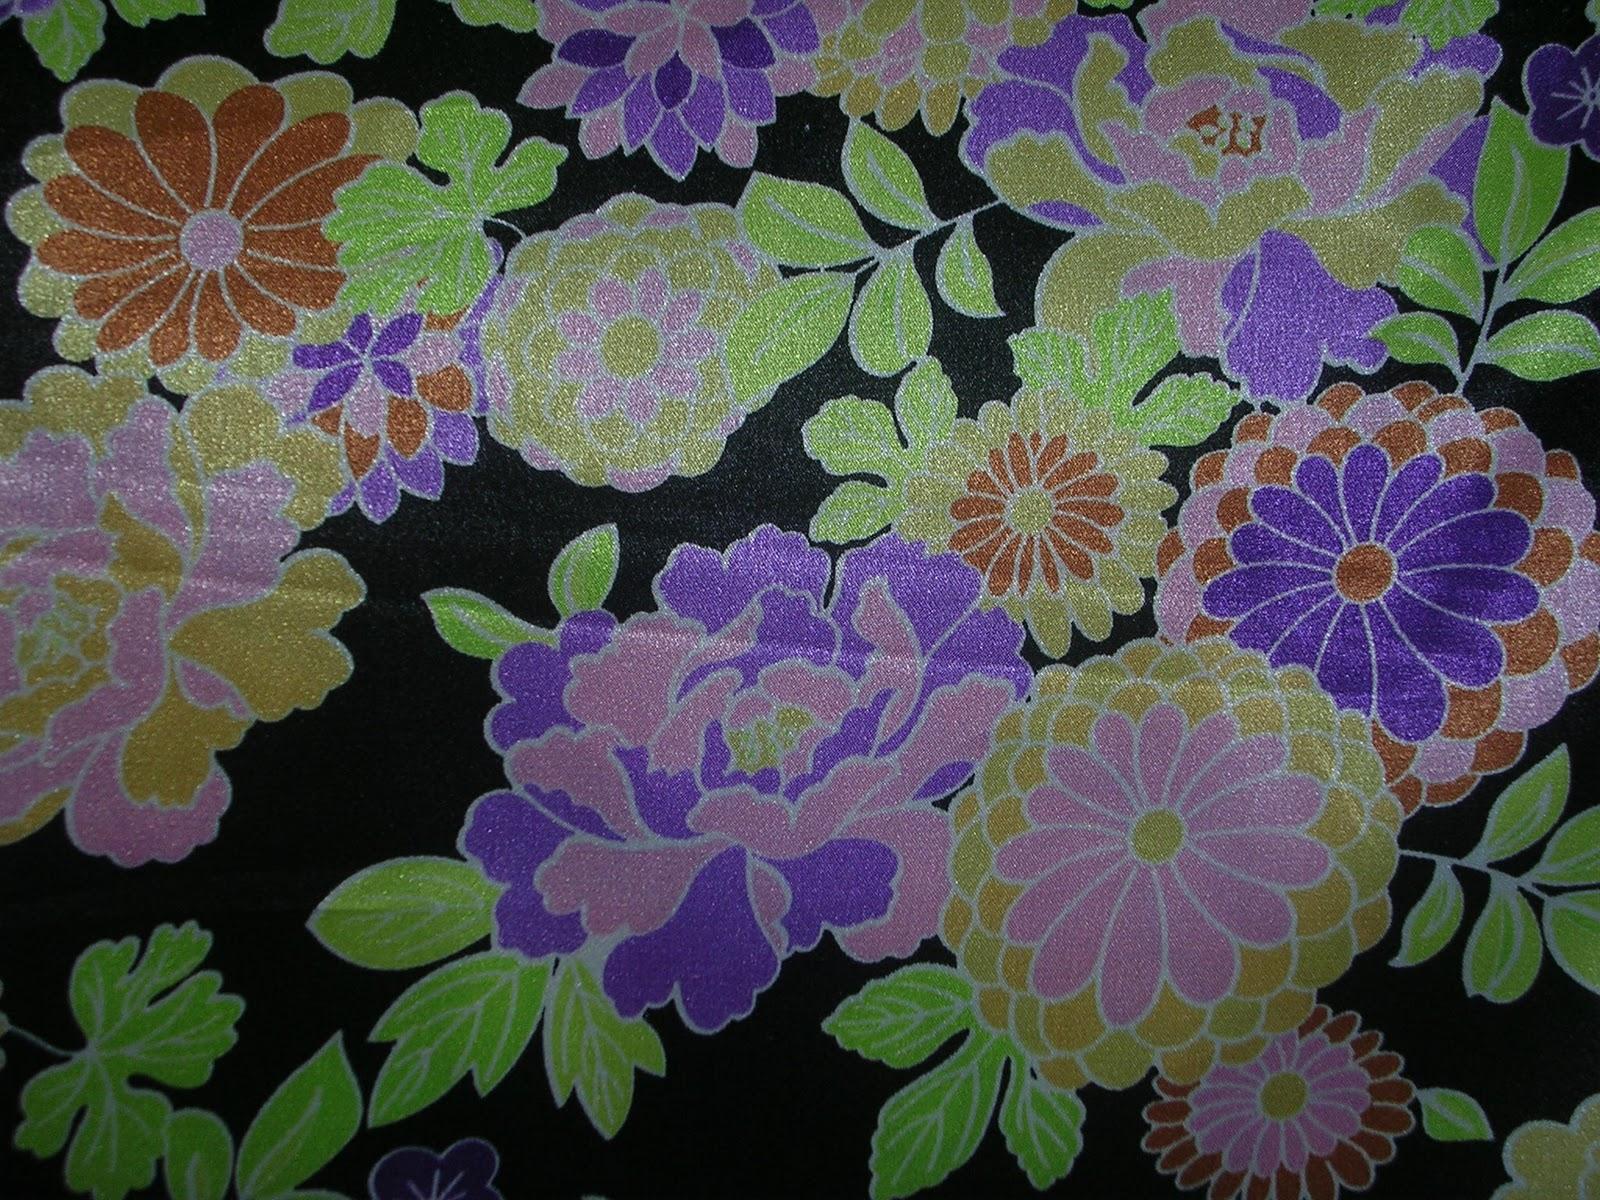 Border bunga tulip joy studio design gallery best design - Corak Bunga Joy Studio Design Gallery Best Design